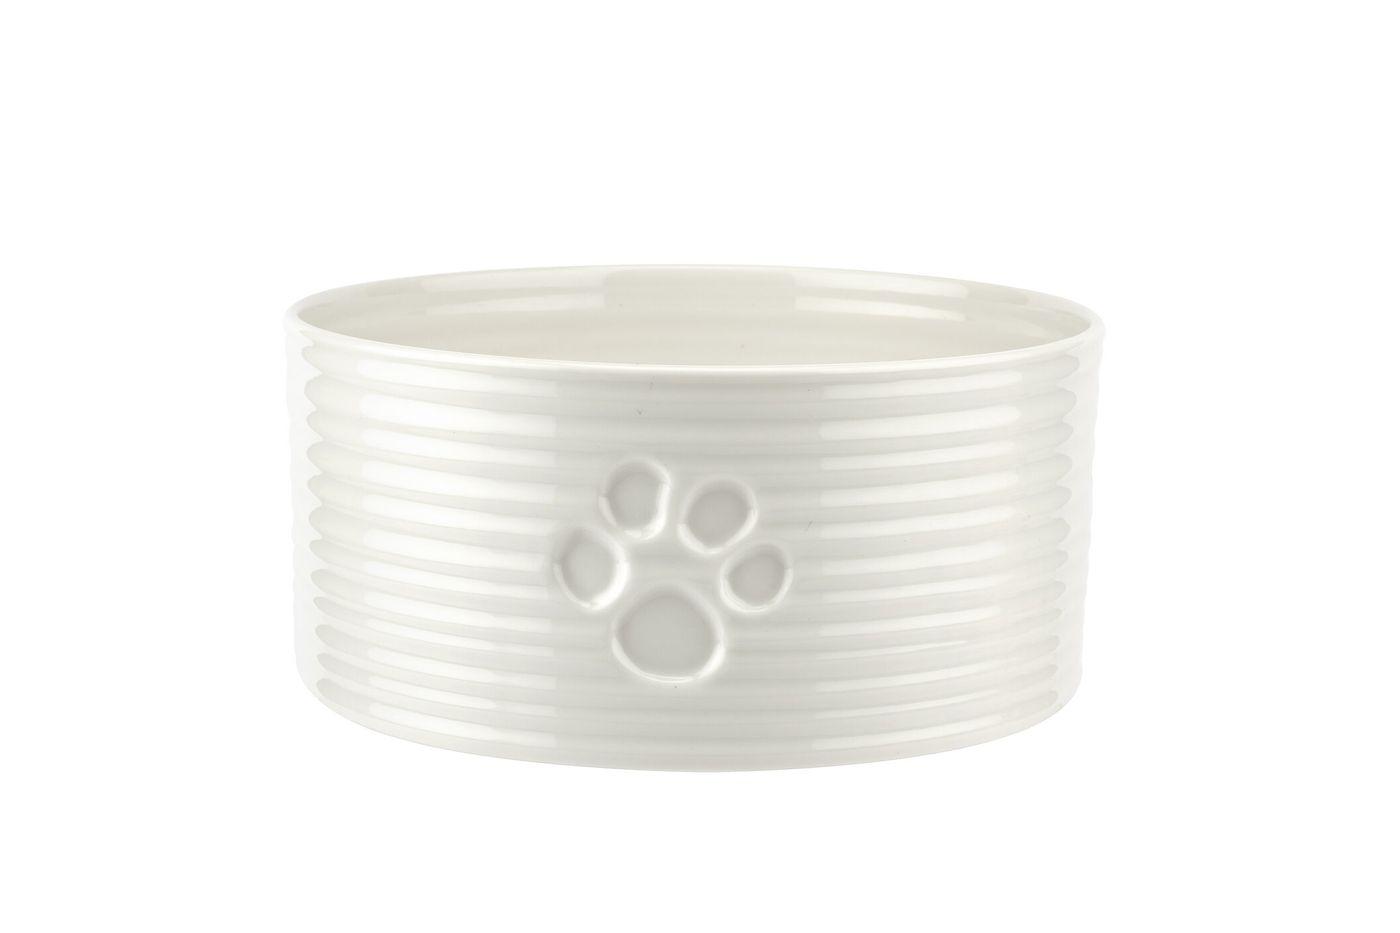 Sophie Conran for Portmeirion White Pet Bowl 19.5cm thumb 1